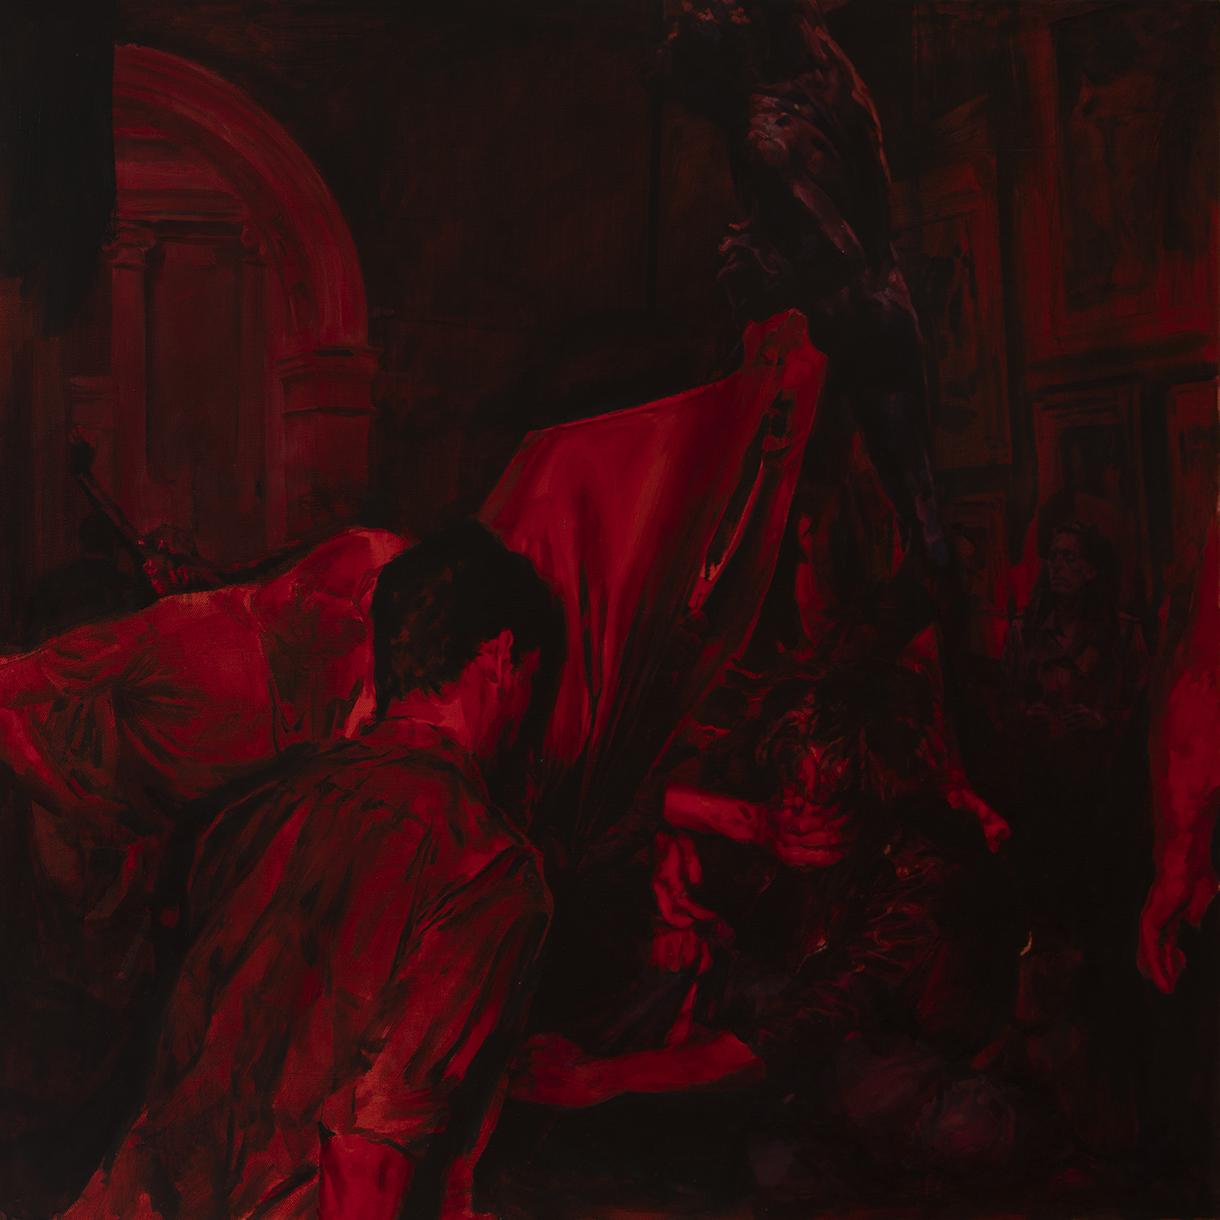 Colossus, 76cm x 76cm, oil on canvas, 2018